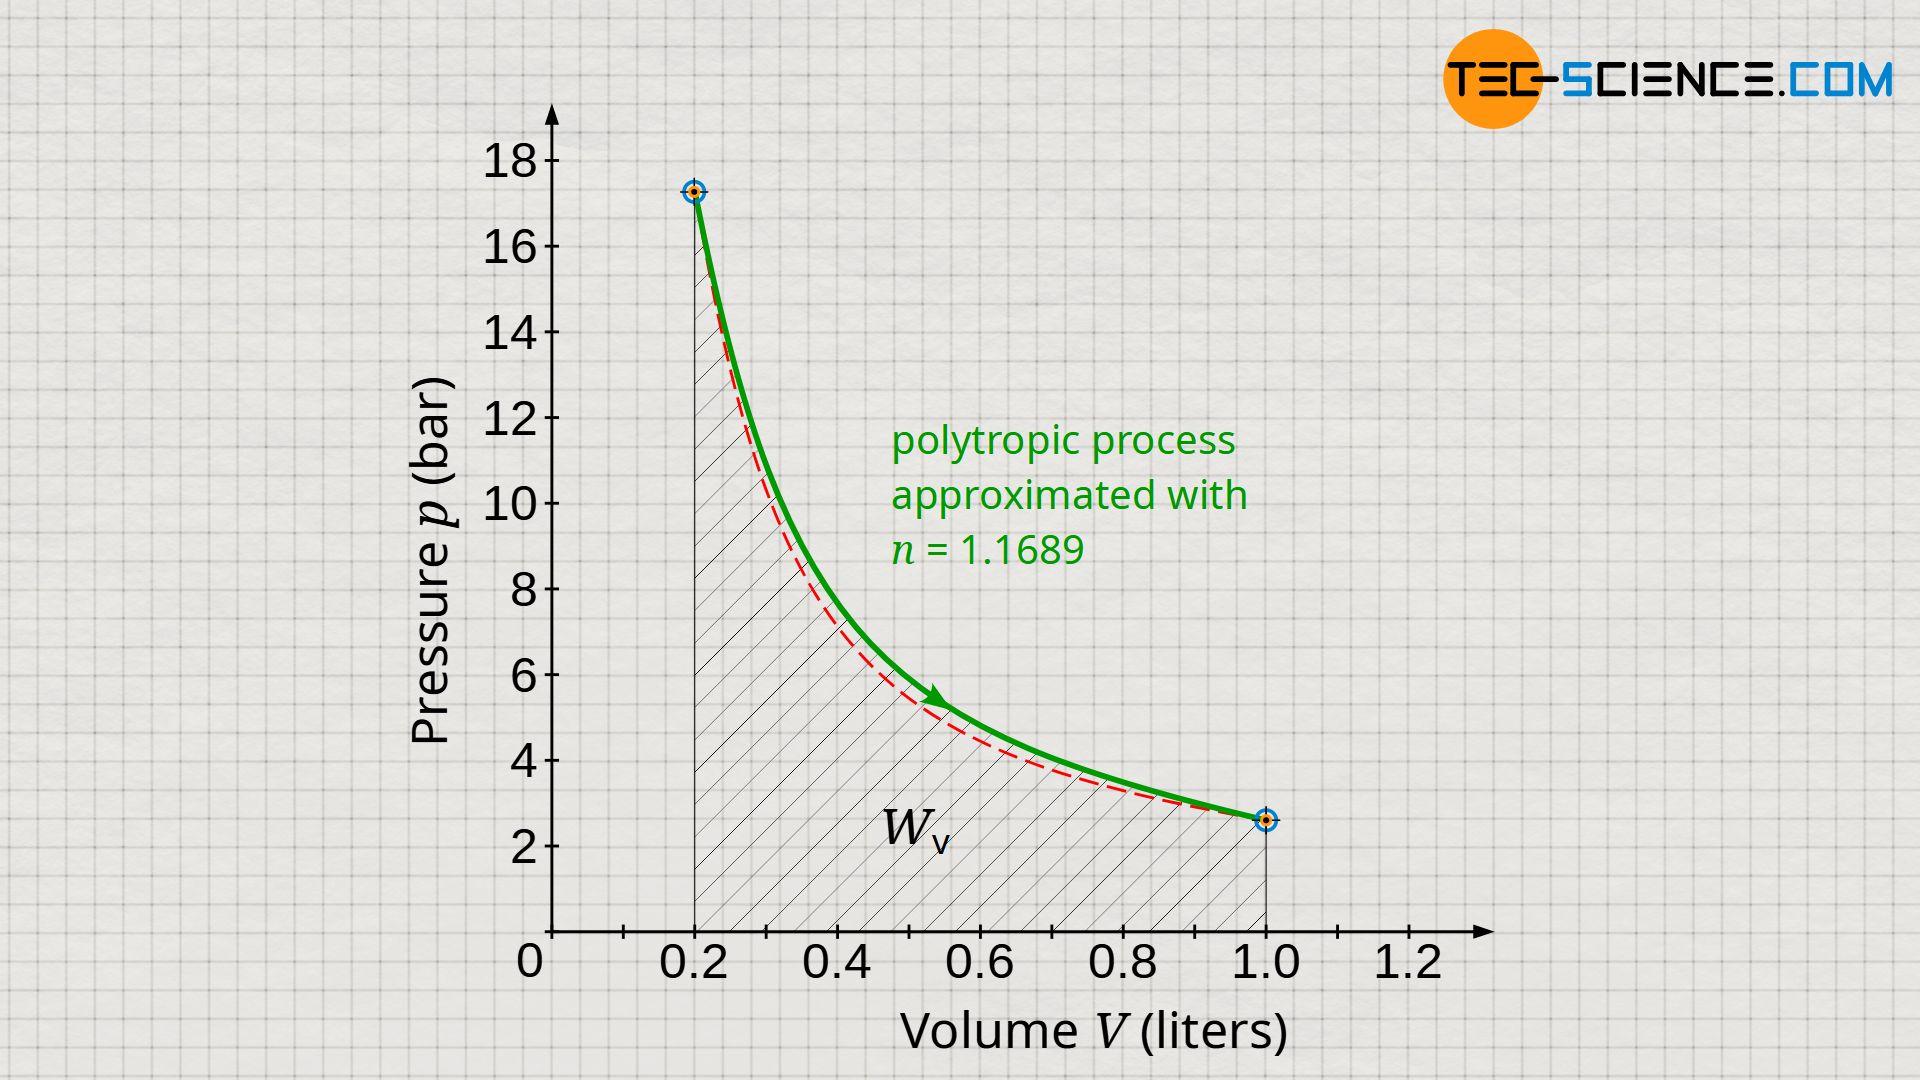 Pressure-volume work of the polytropic process